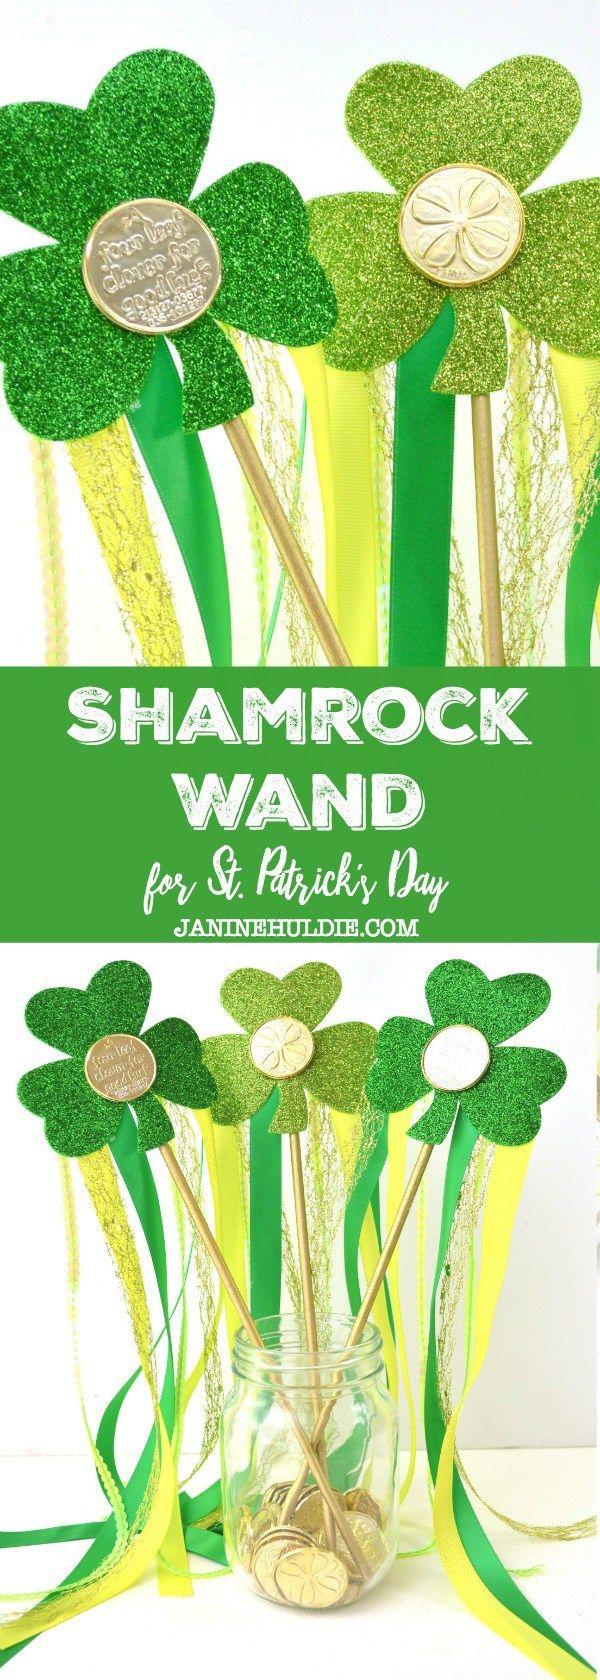 Sparkly Shamrock Wand Craft